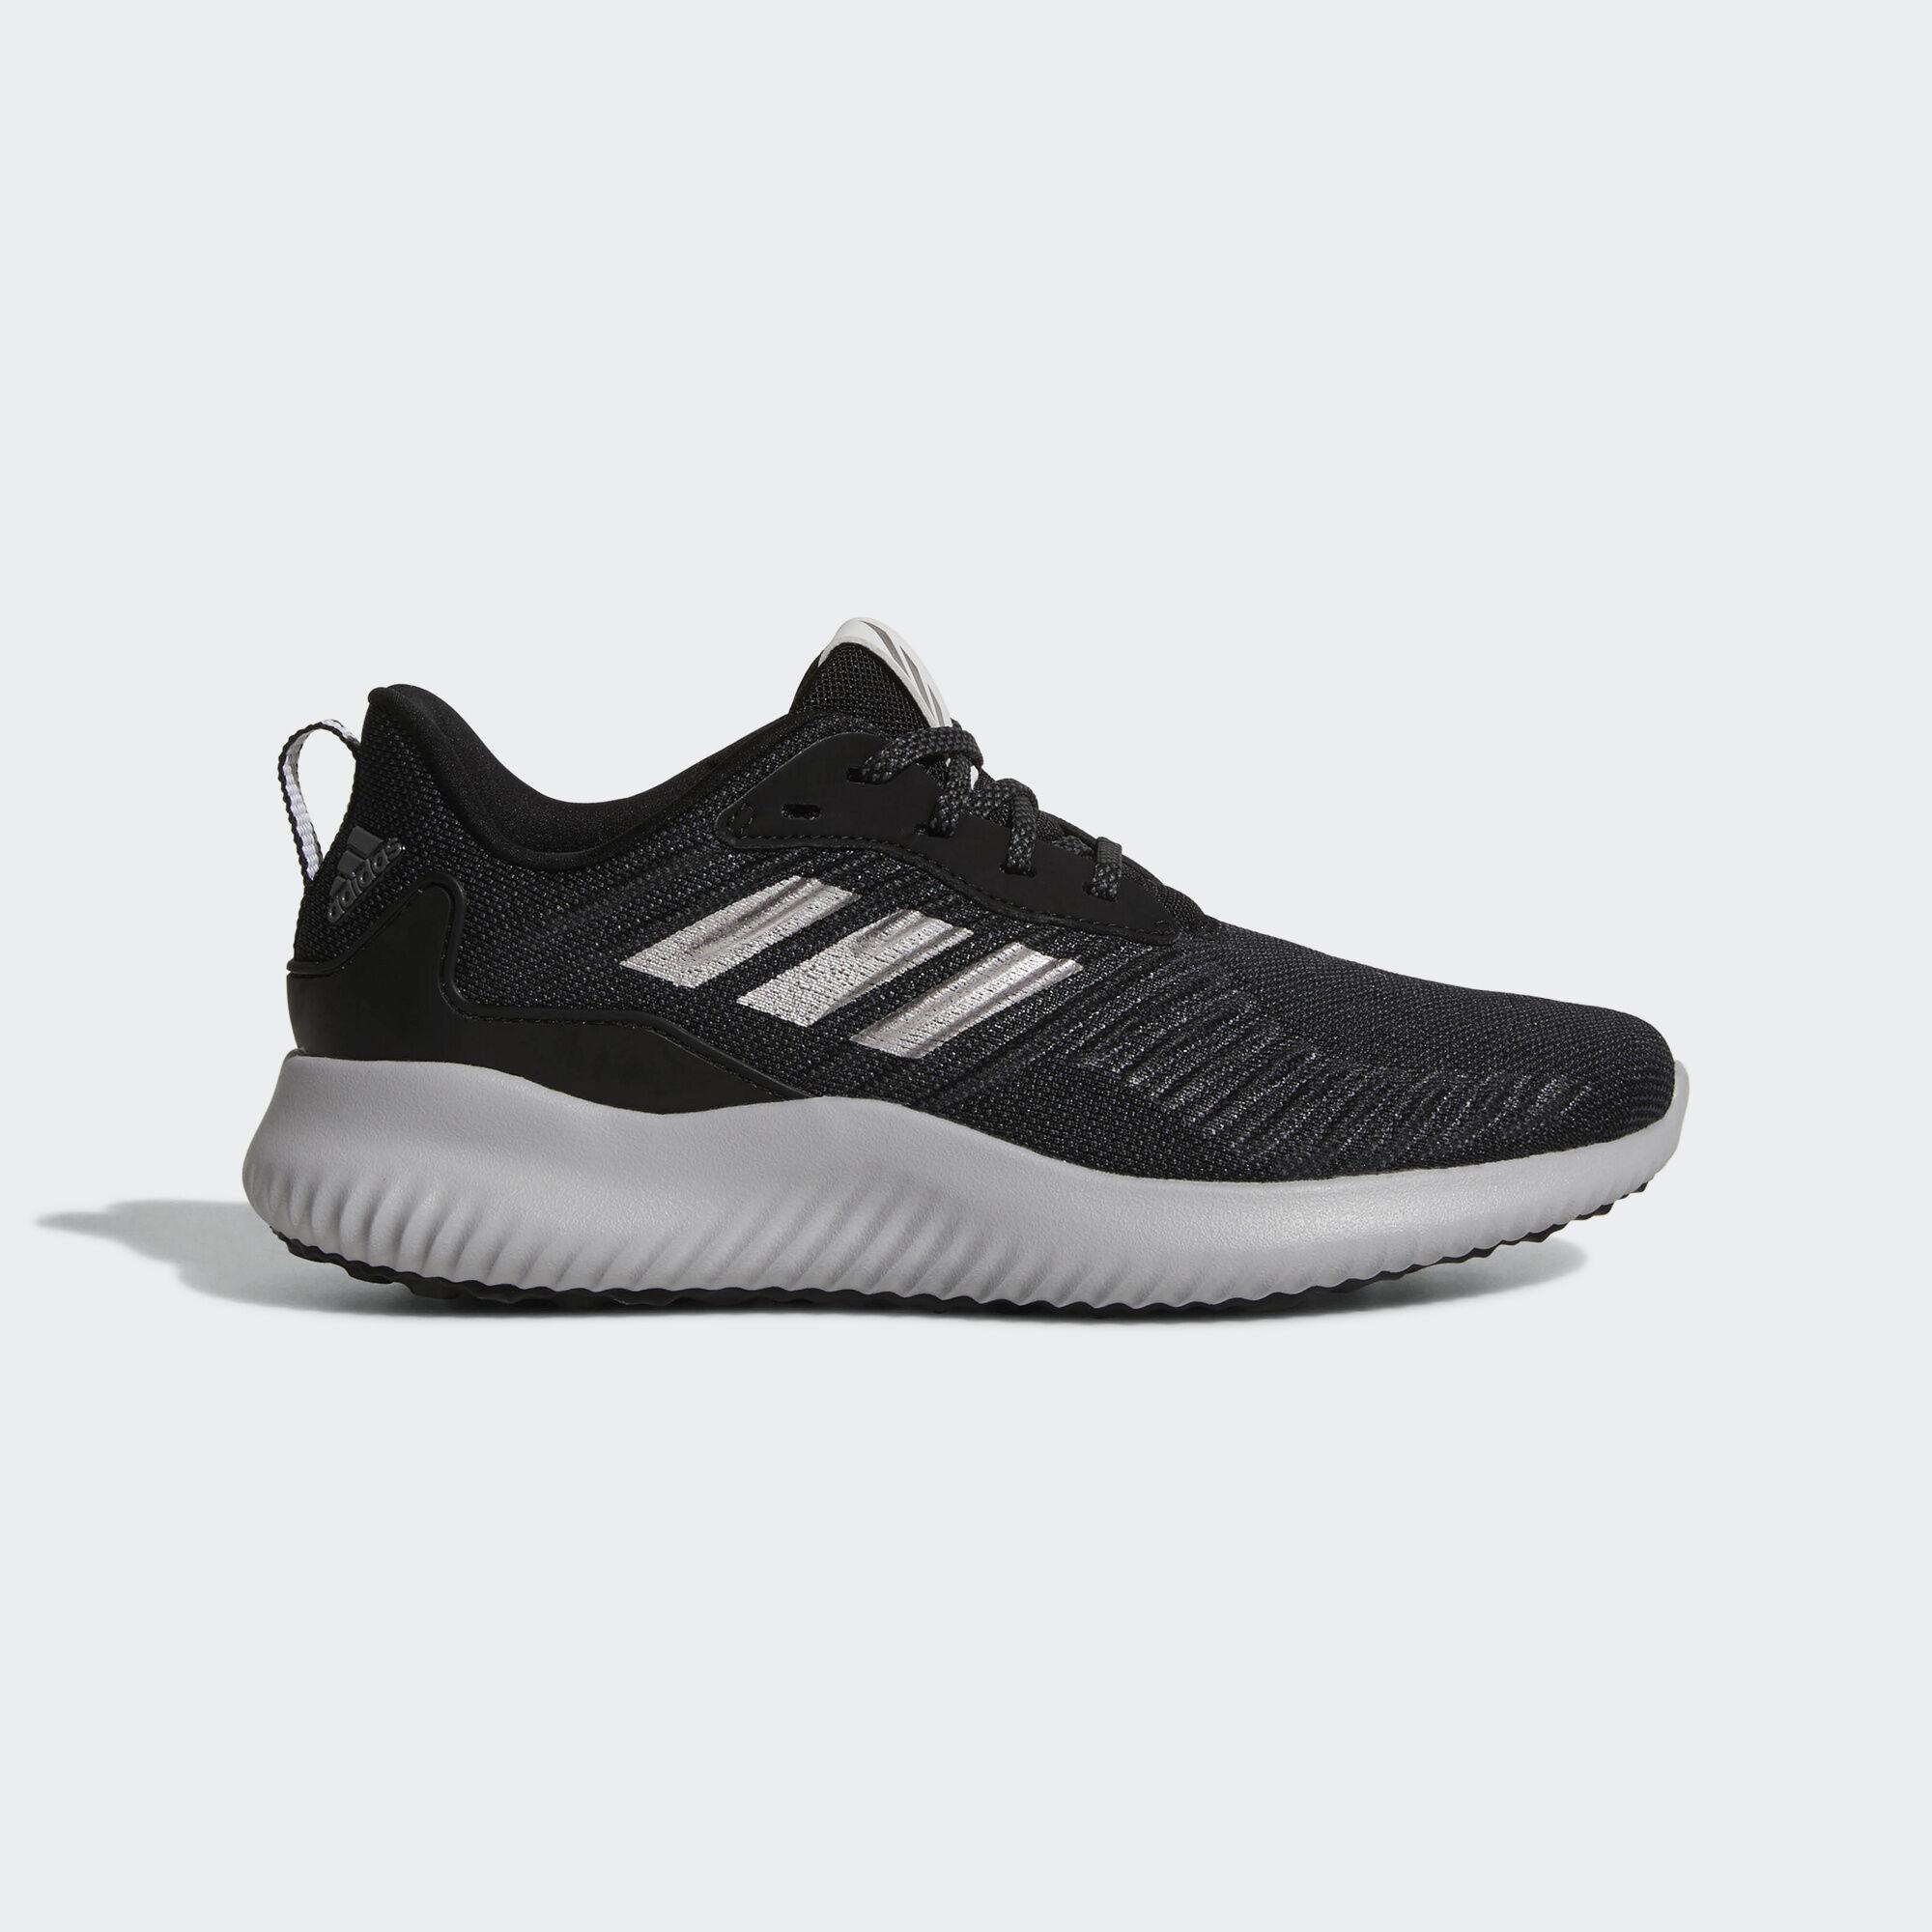 Adidas alphabounce rc scarpe adidas regionale nero